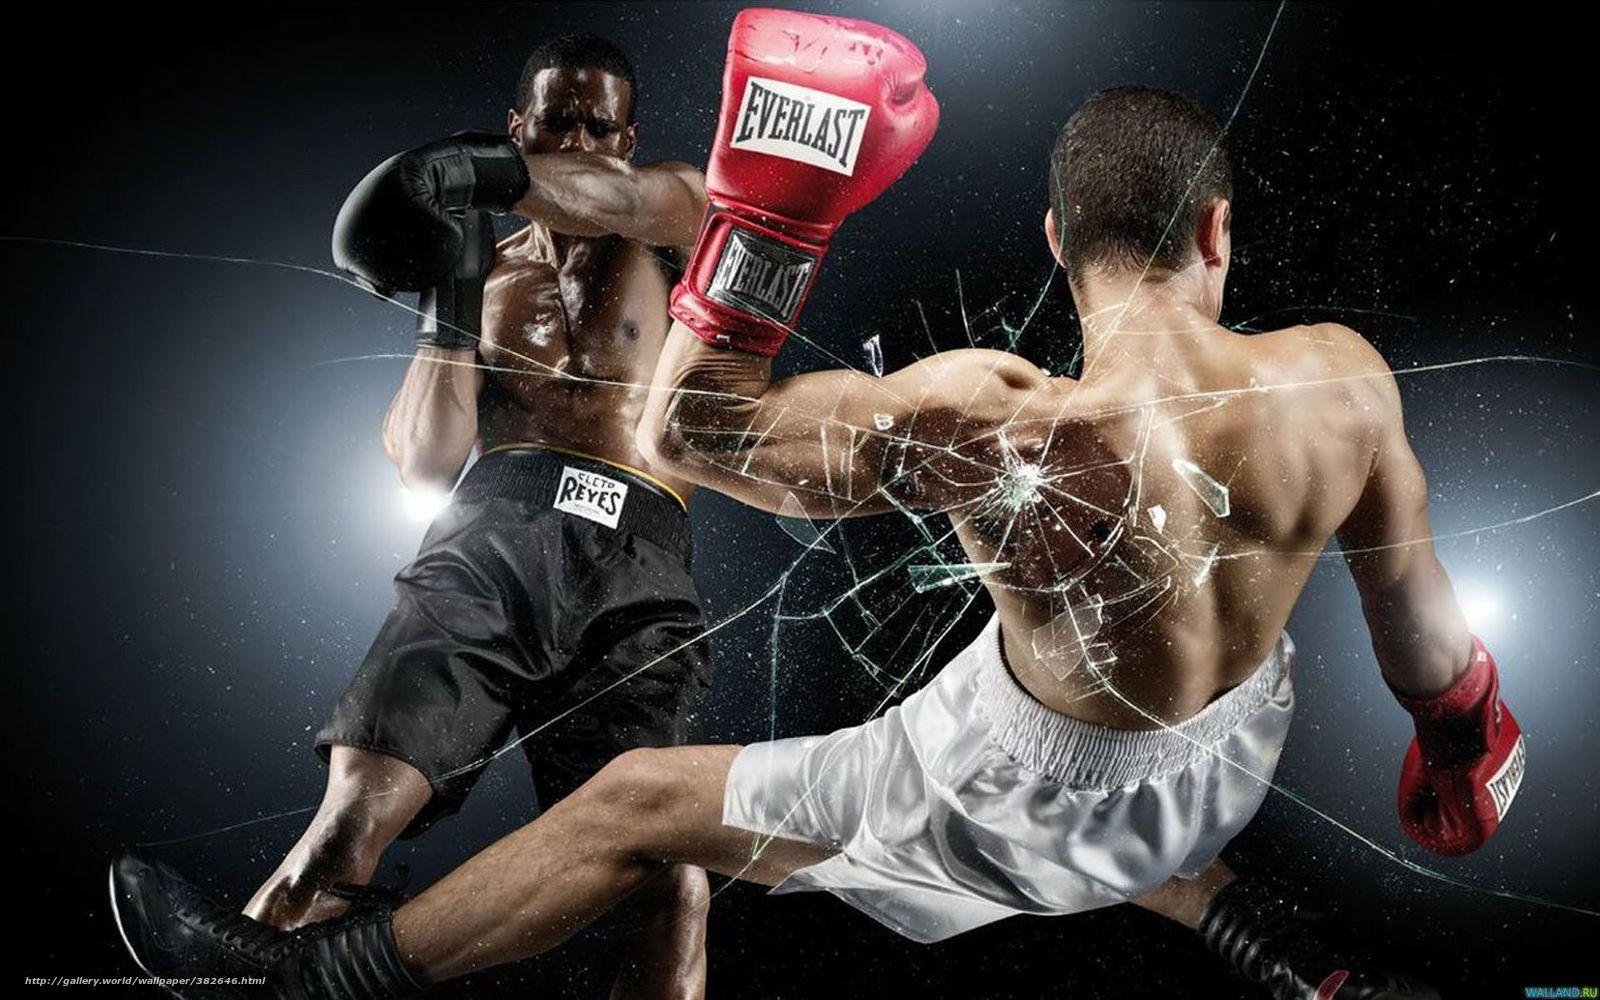 Скачать обои бокс удар нокаут ринг